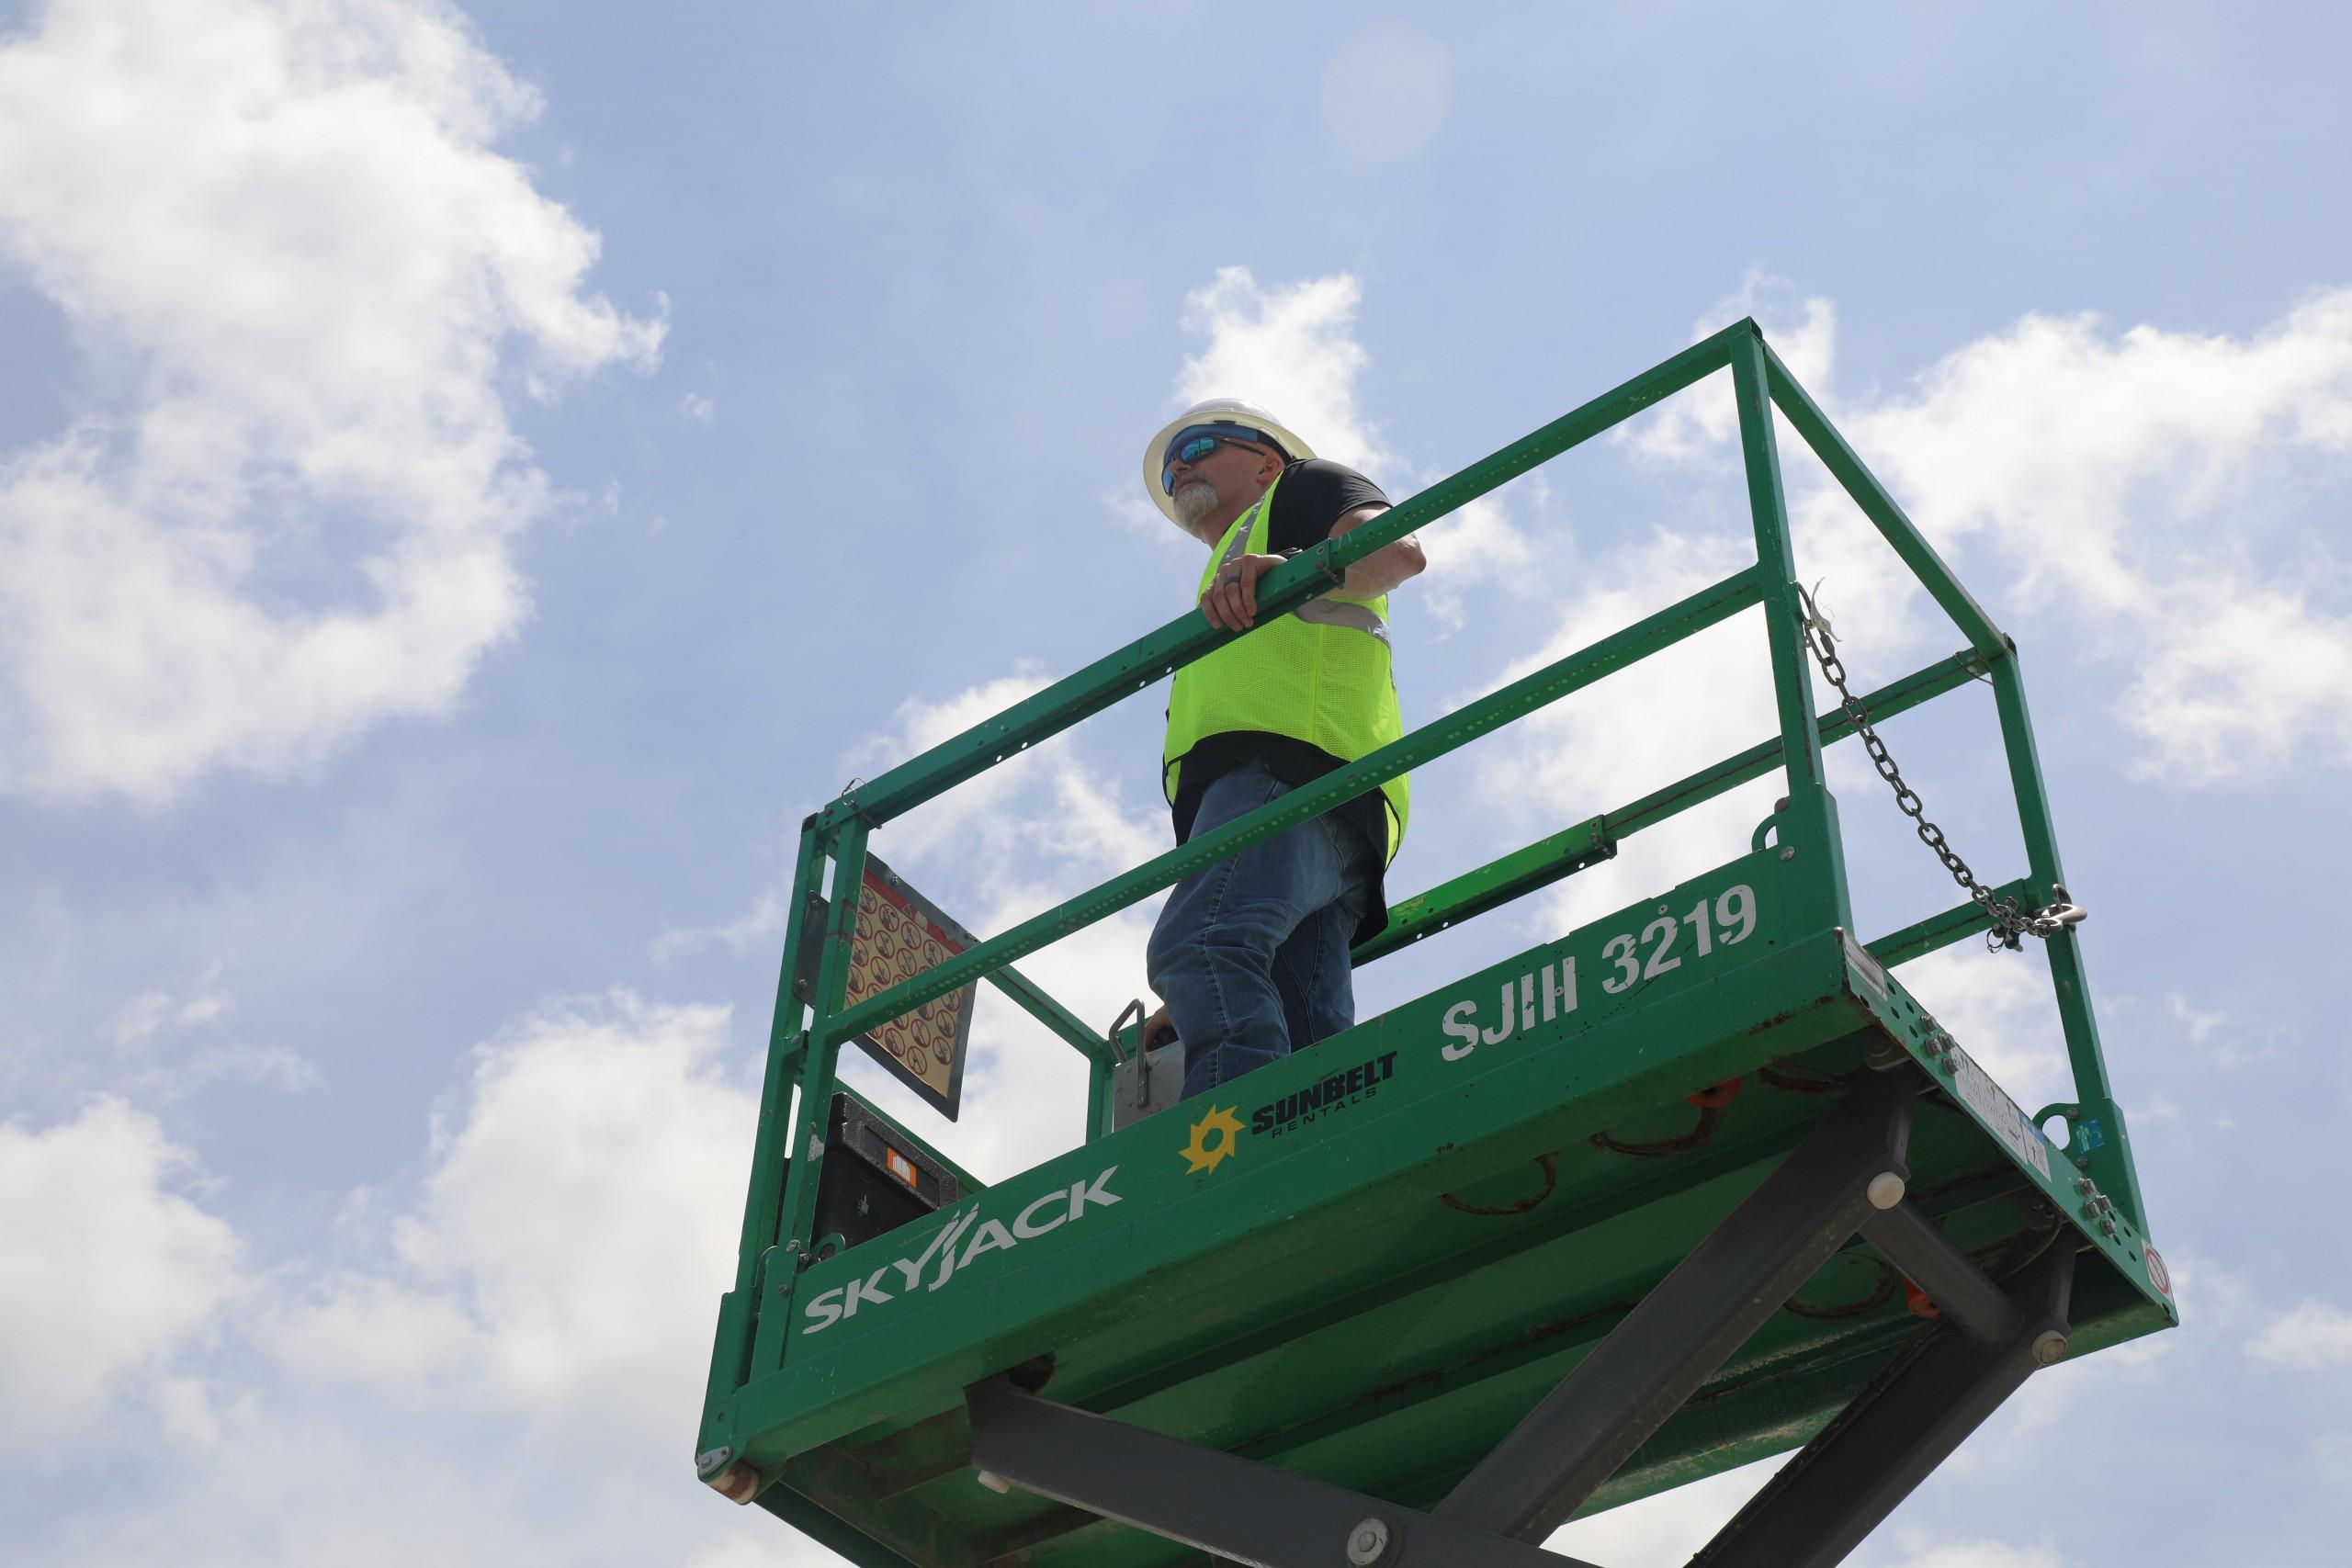 Wachter Employee Safely Operating Scissor Lift